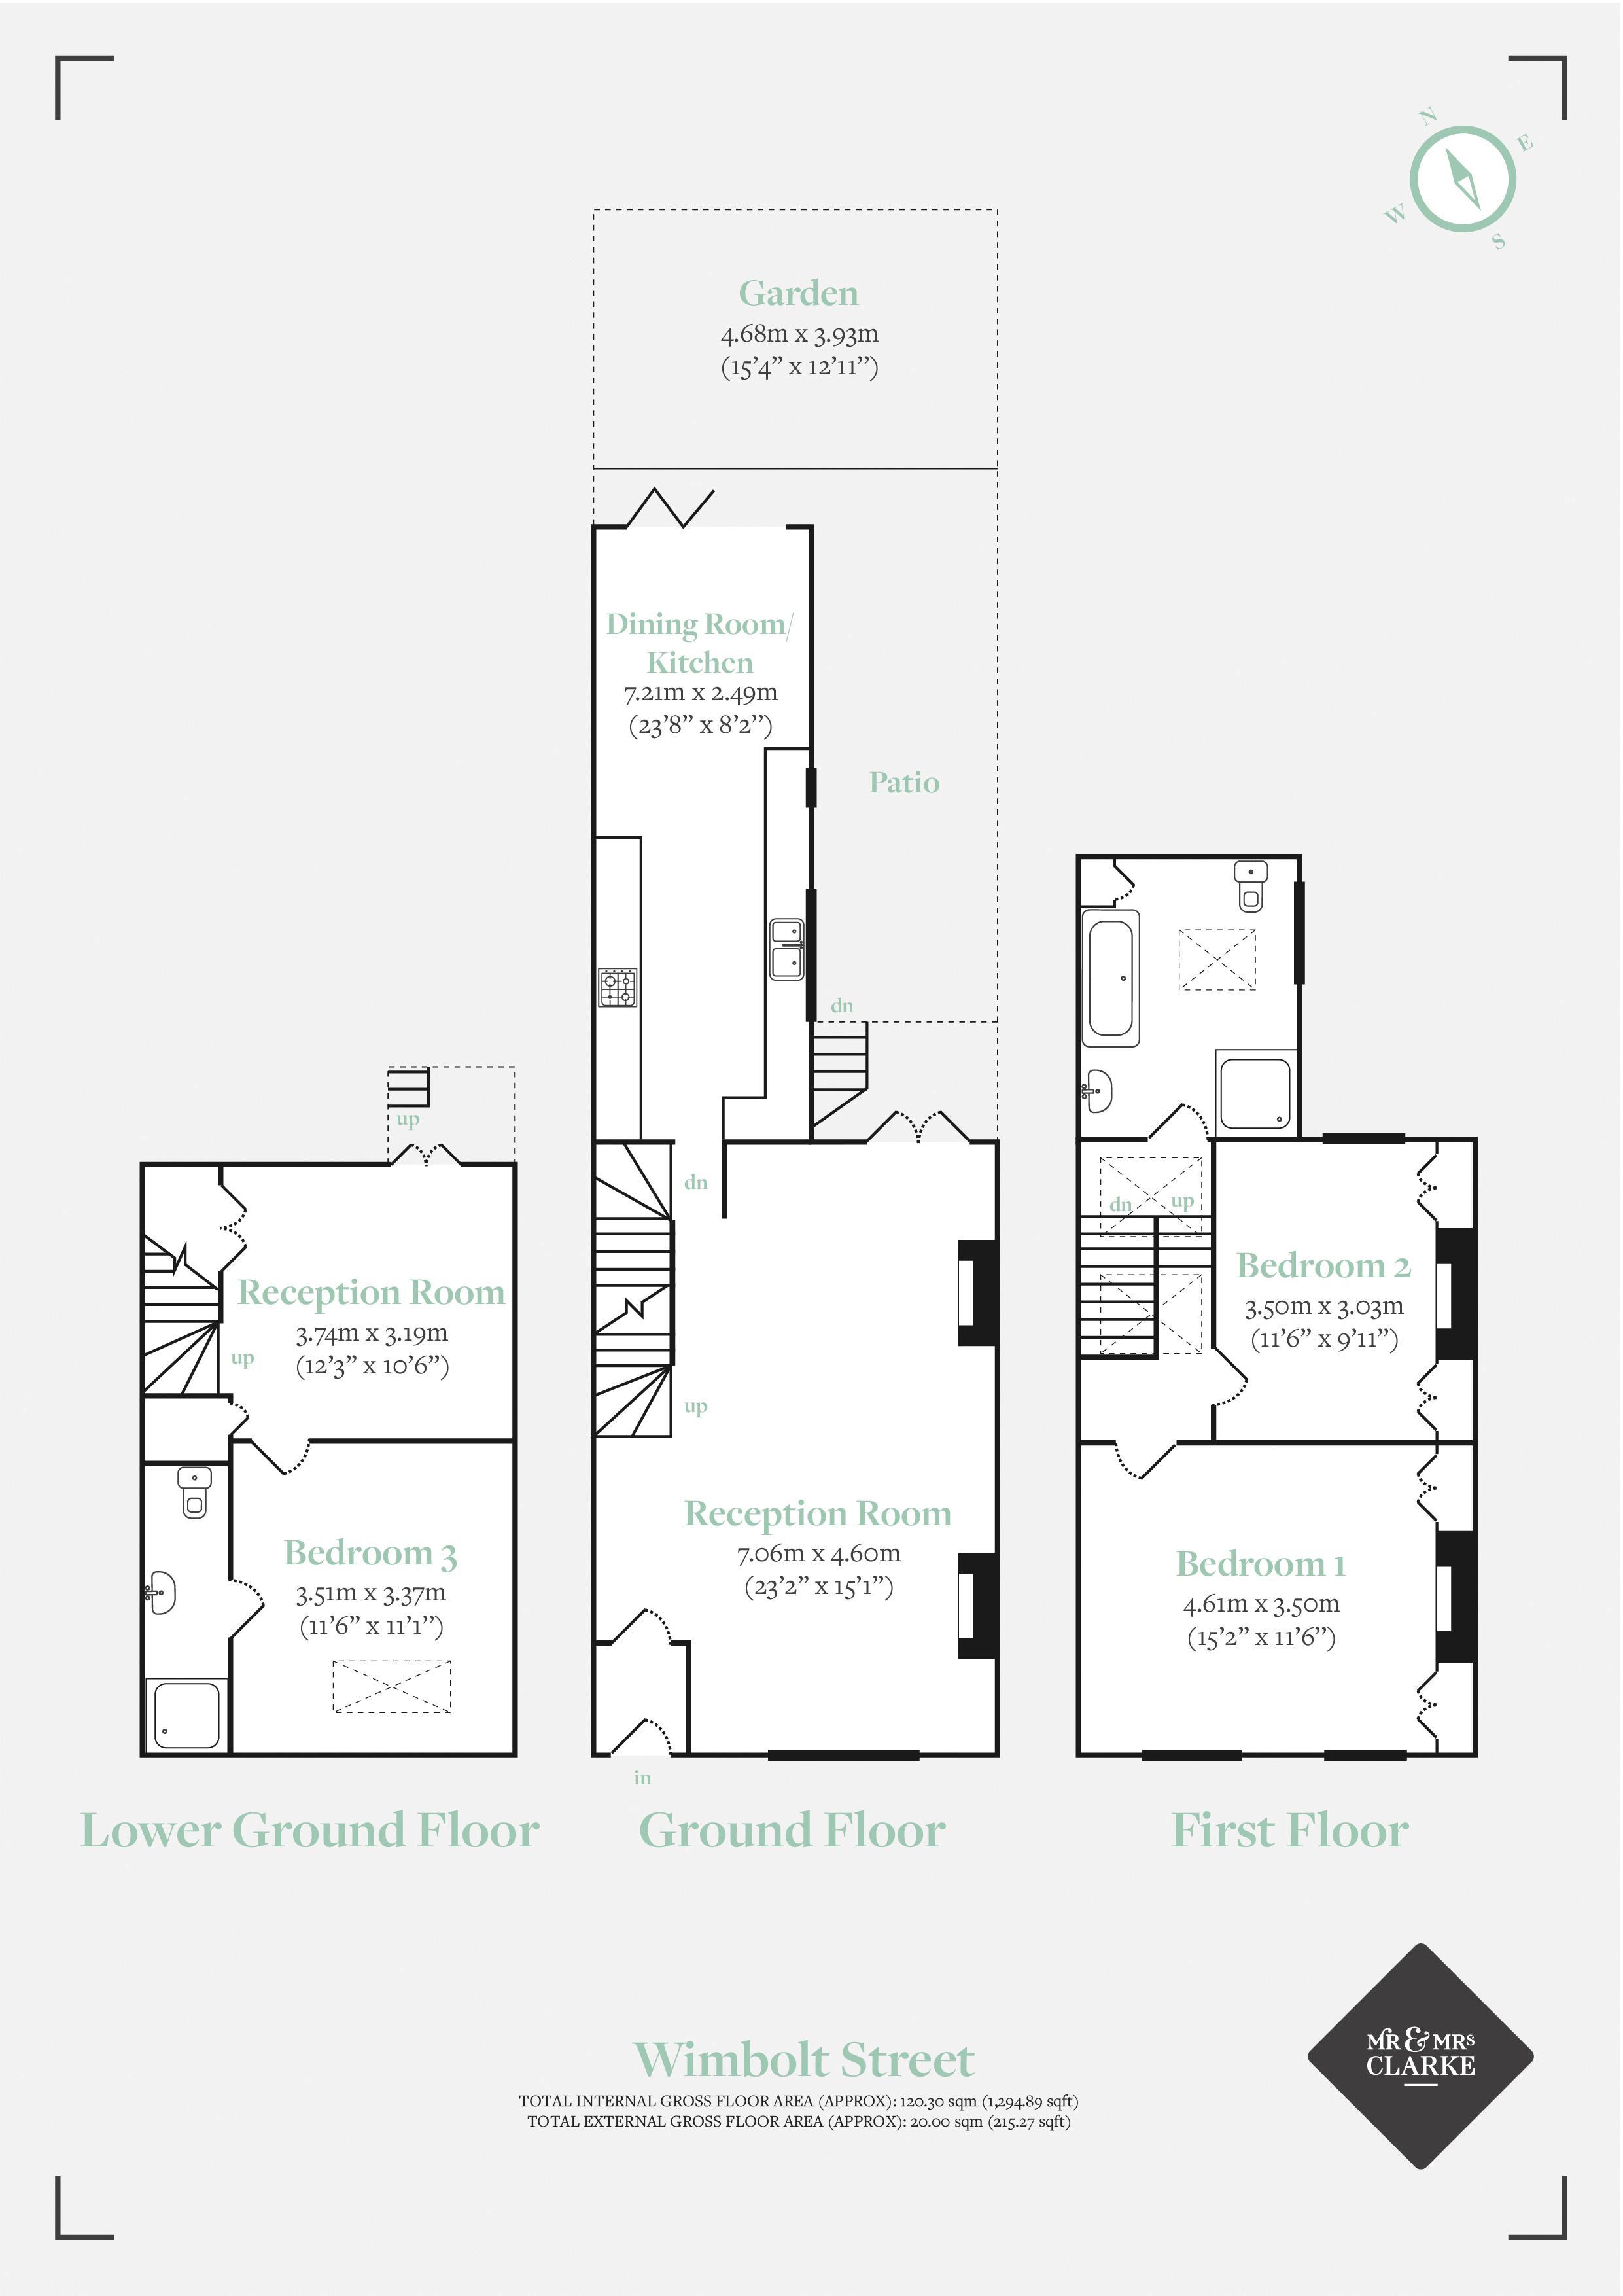 Wimbolt Street, London. Floorplan. Floor Plan.